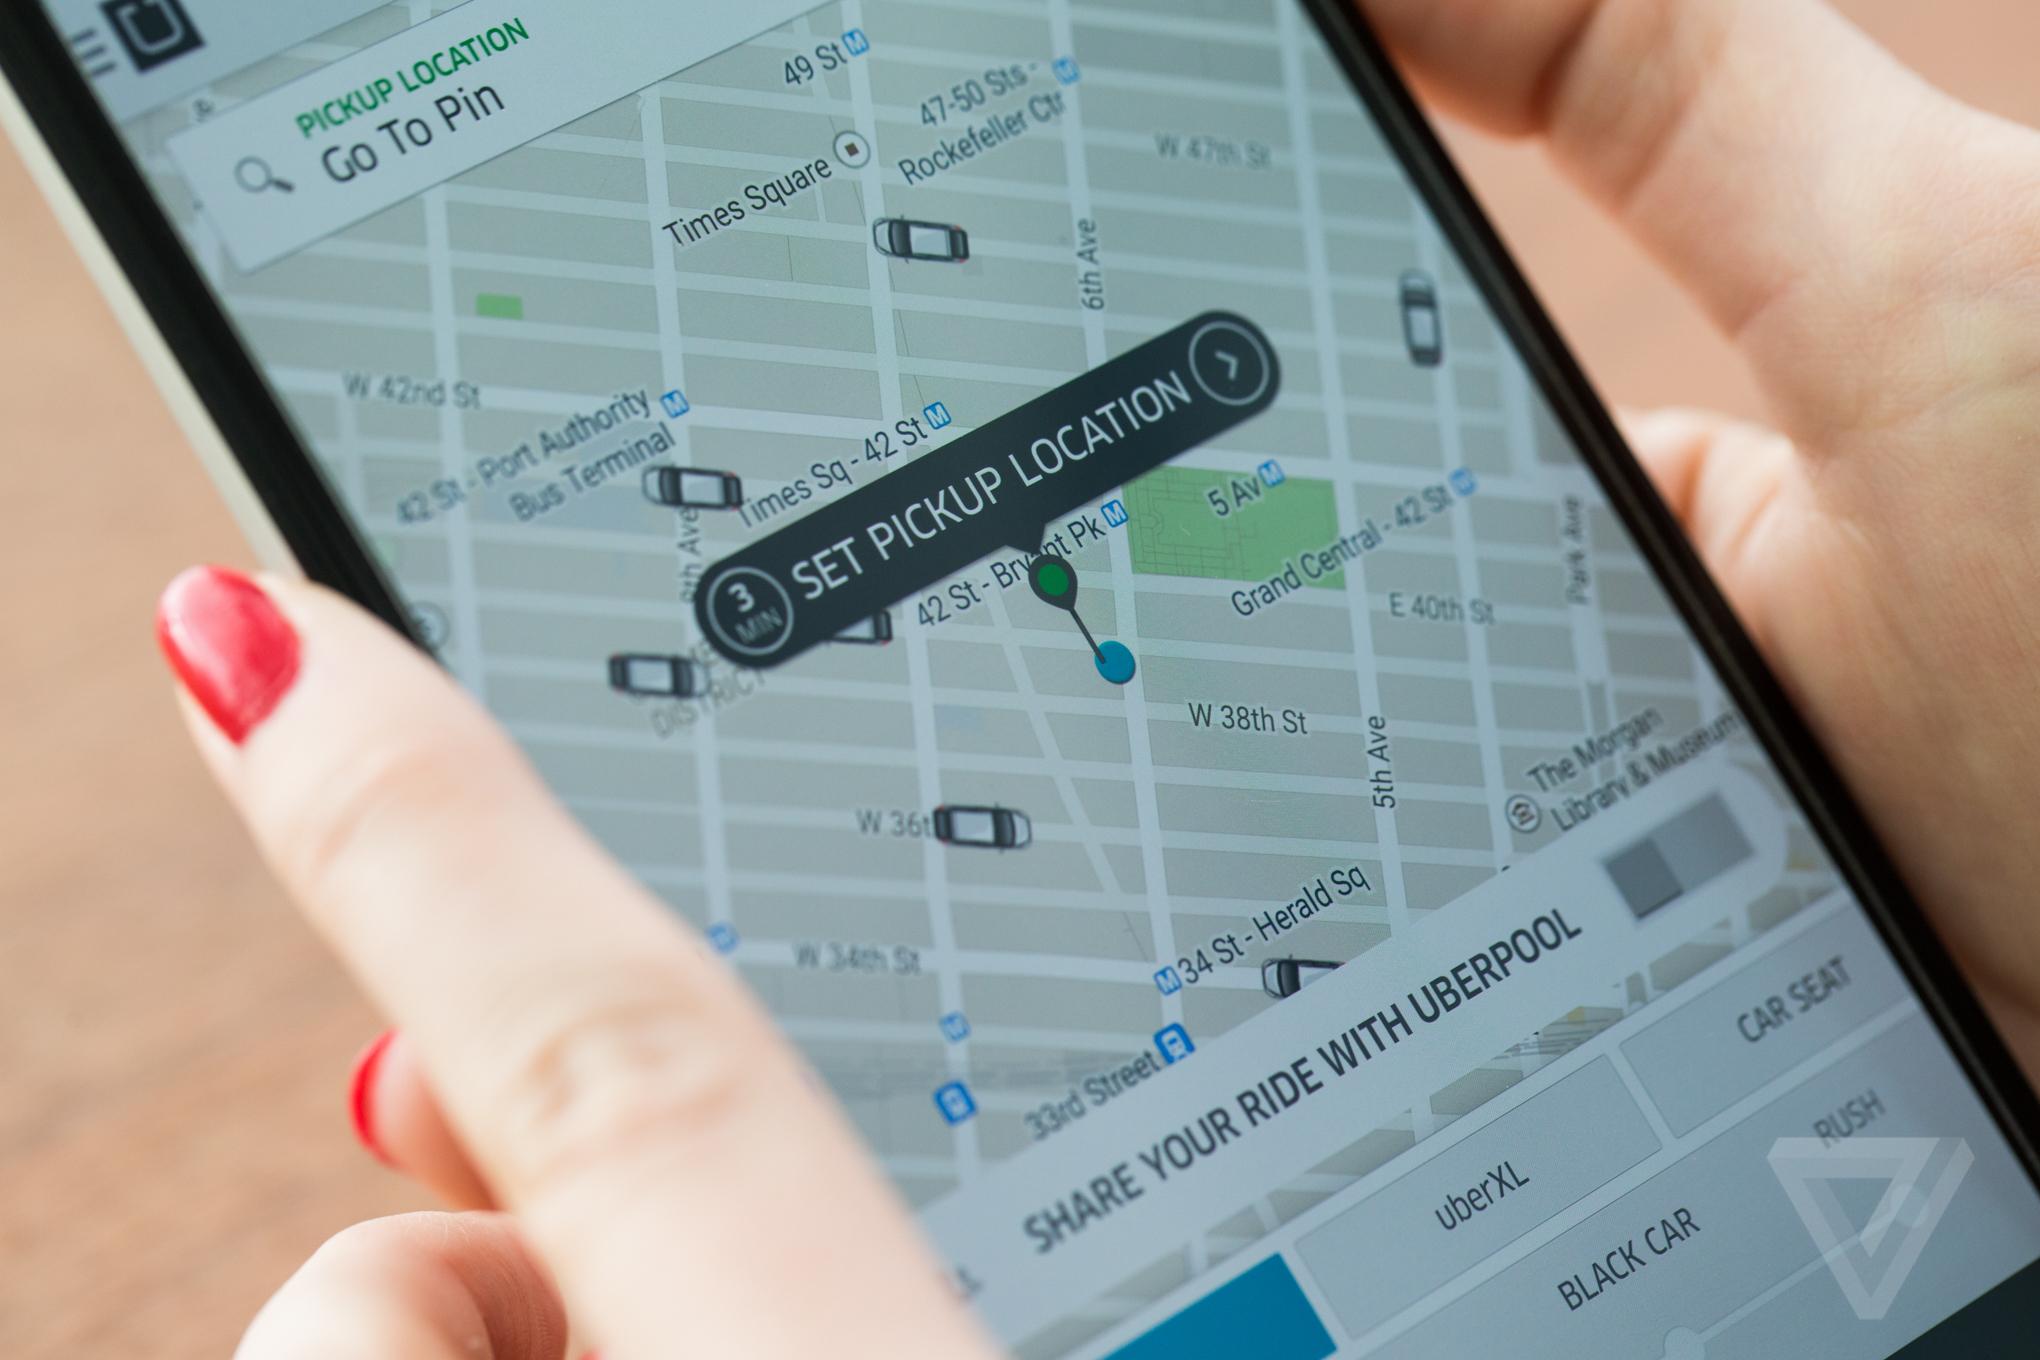 Uber stock image